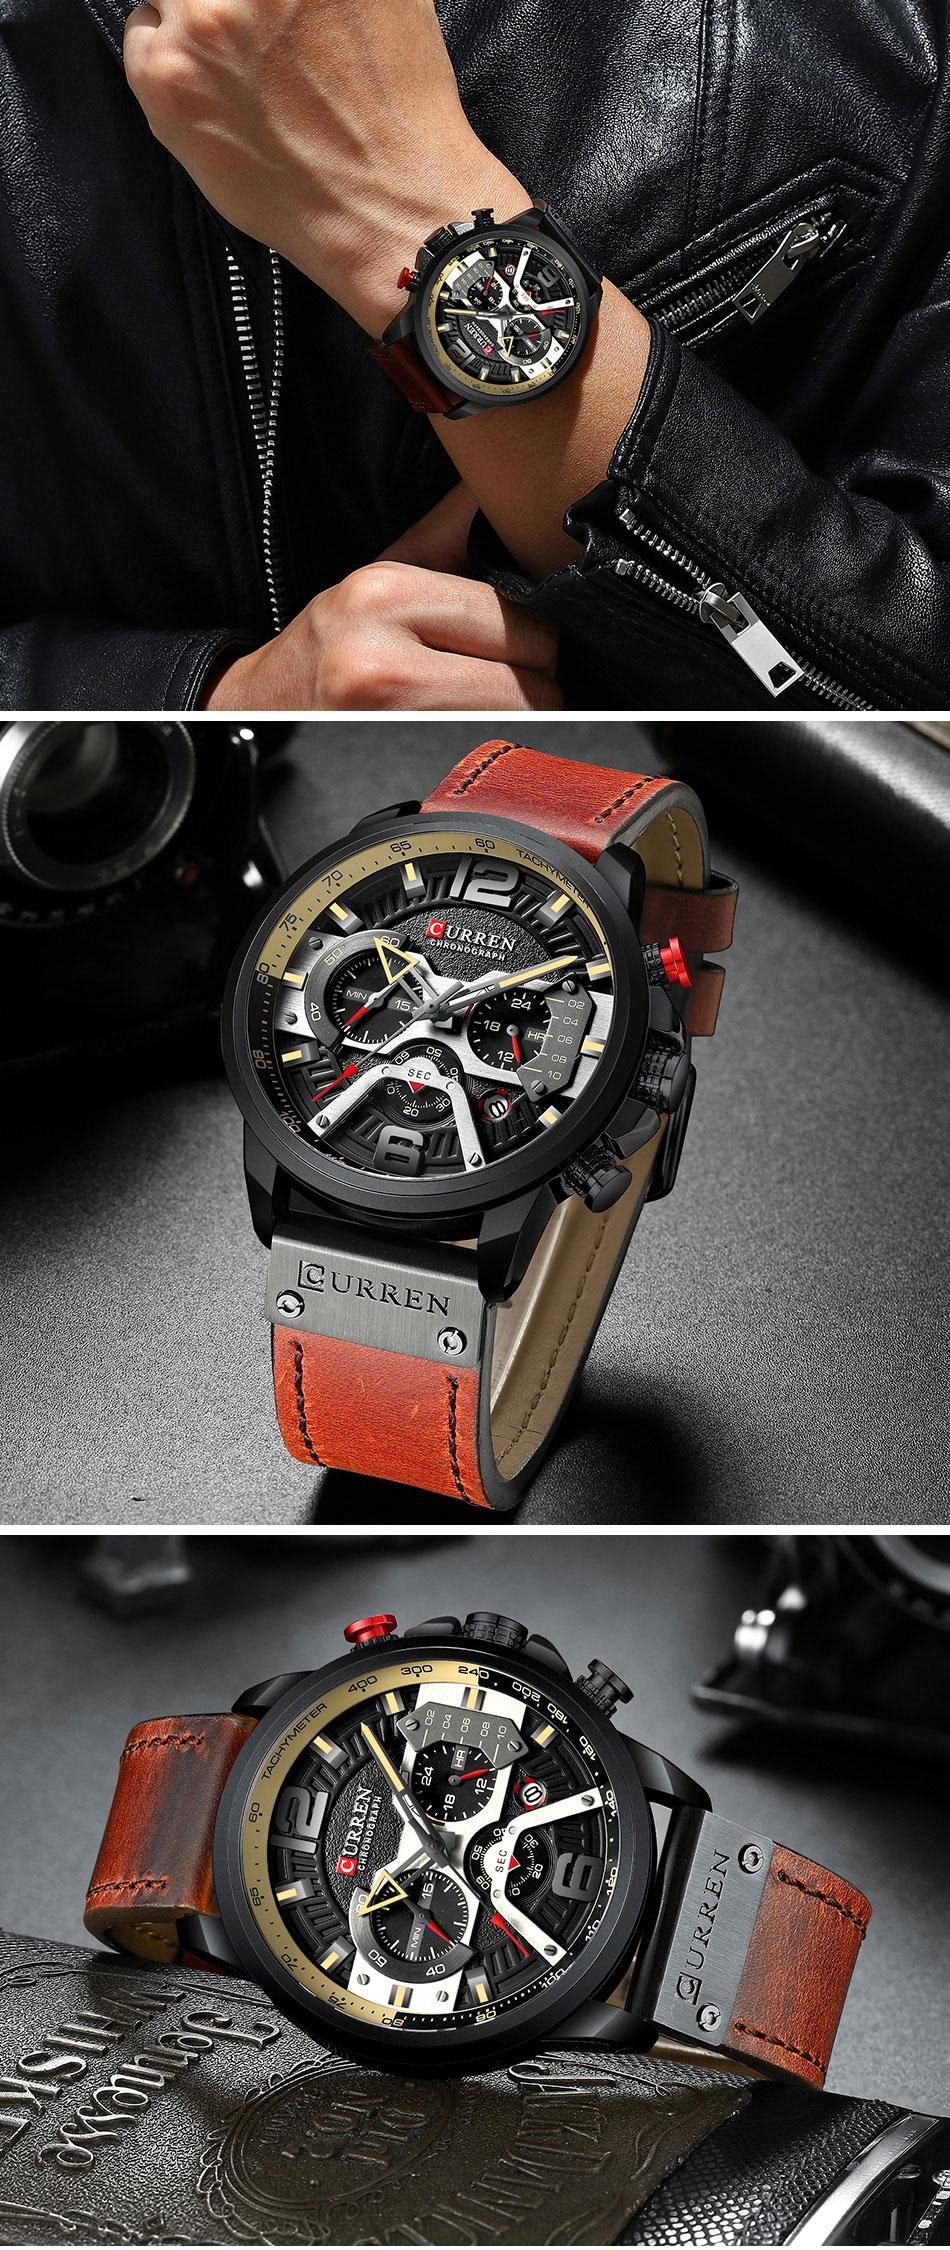 HTB1XaY6VNnaK1RjSZFBq6AW7VXaP CURREN Luxury Brand Men Analog Leather Sports Watches Men's Army Military Watch Male Date Quartz Clock Relogio Masculino 2019